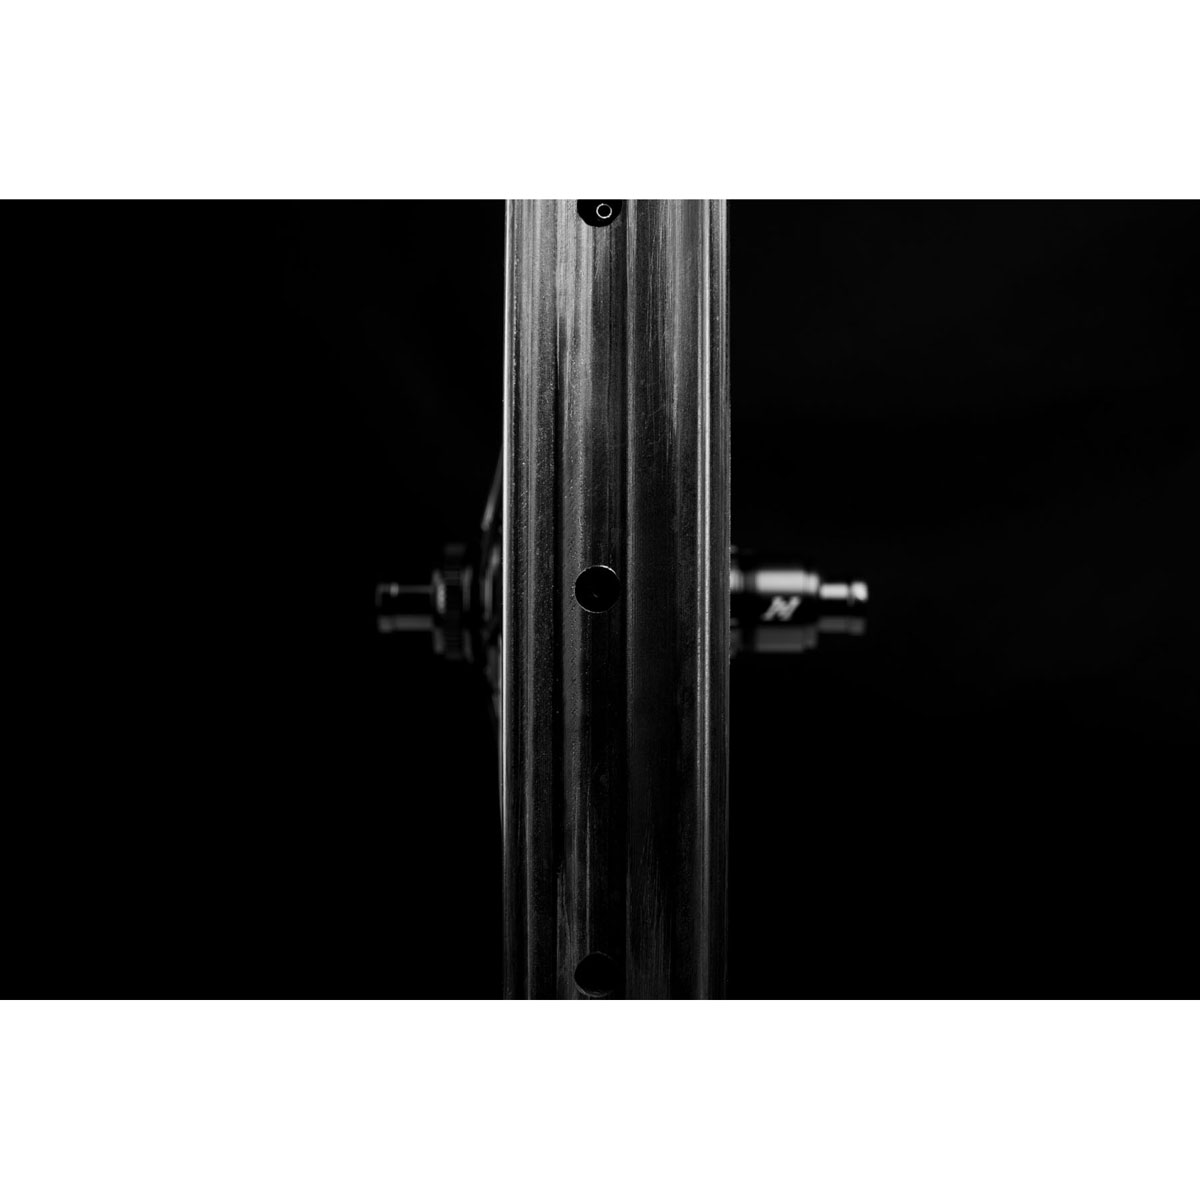 Image of ENVE Foundation AM30 29″ Carbon Wheelset - i9 - Centerlock - FW: 15x110mm | RW: 12x148mm - Shimano Micro Spline